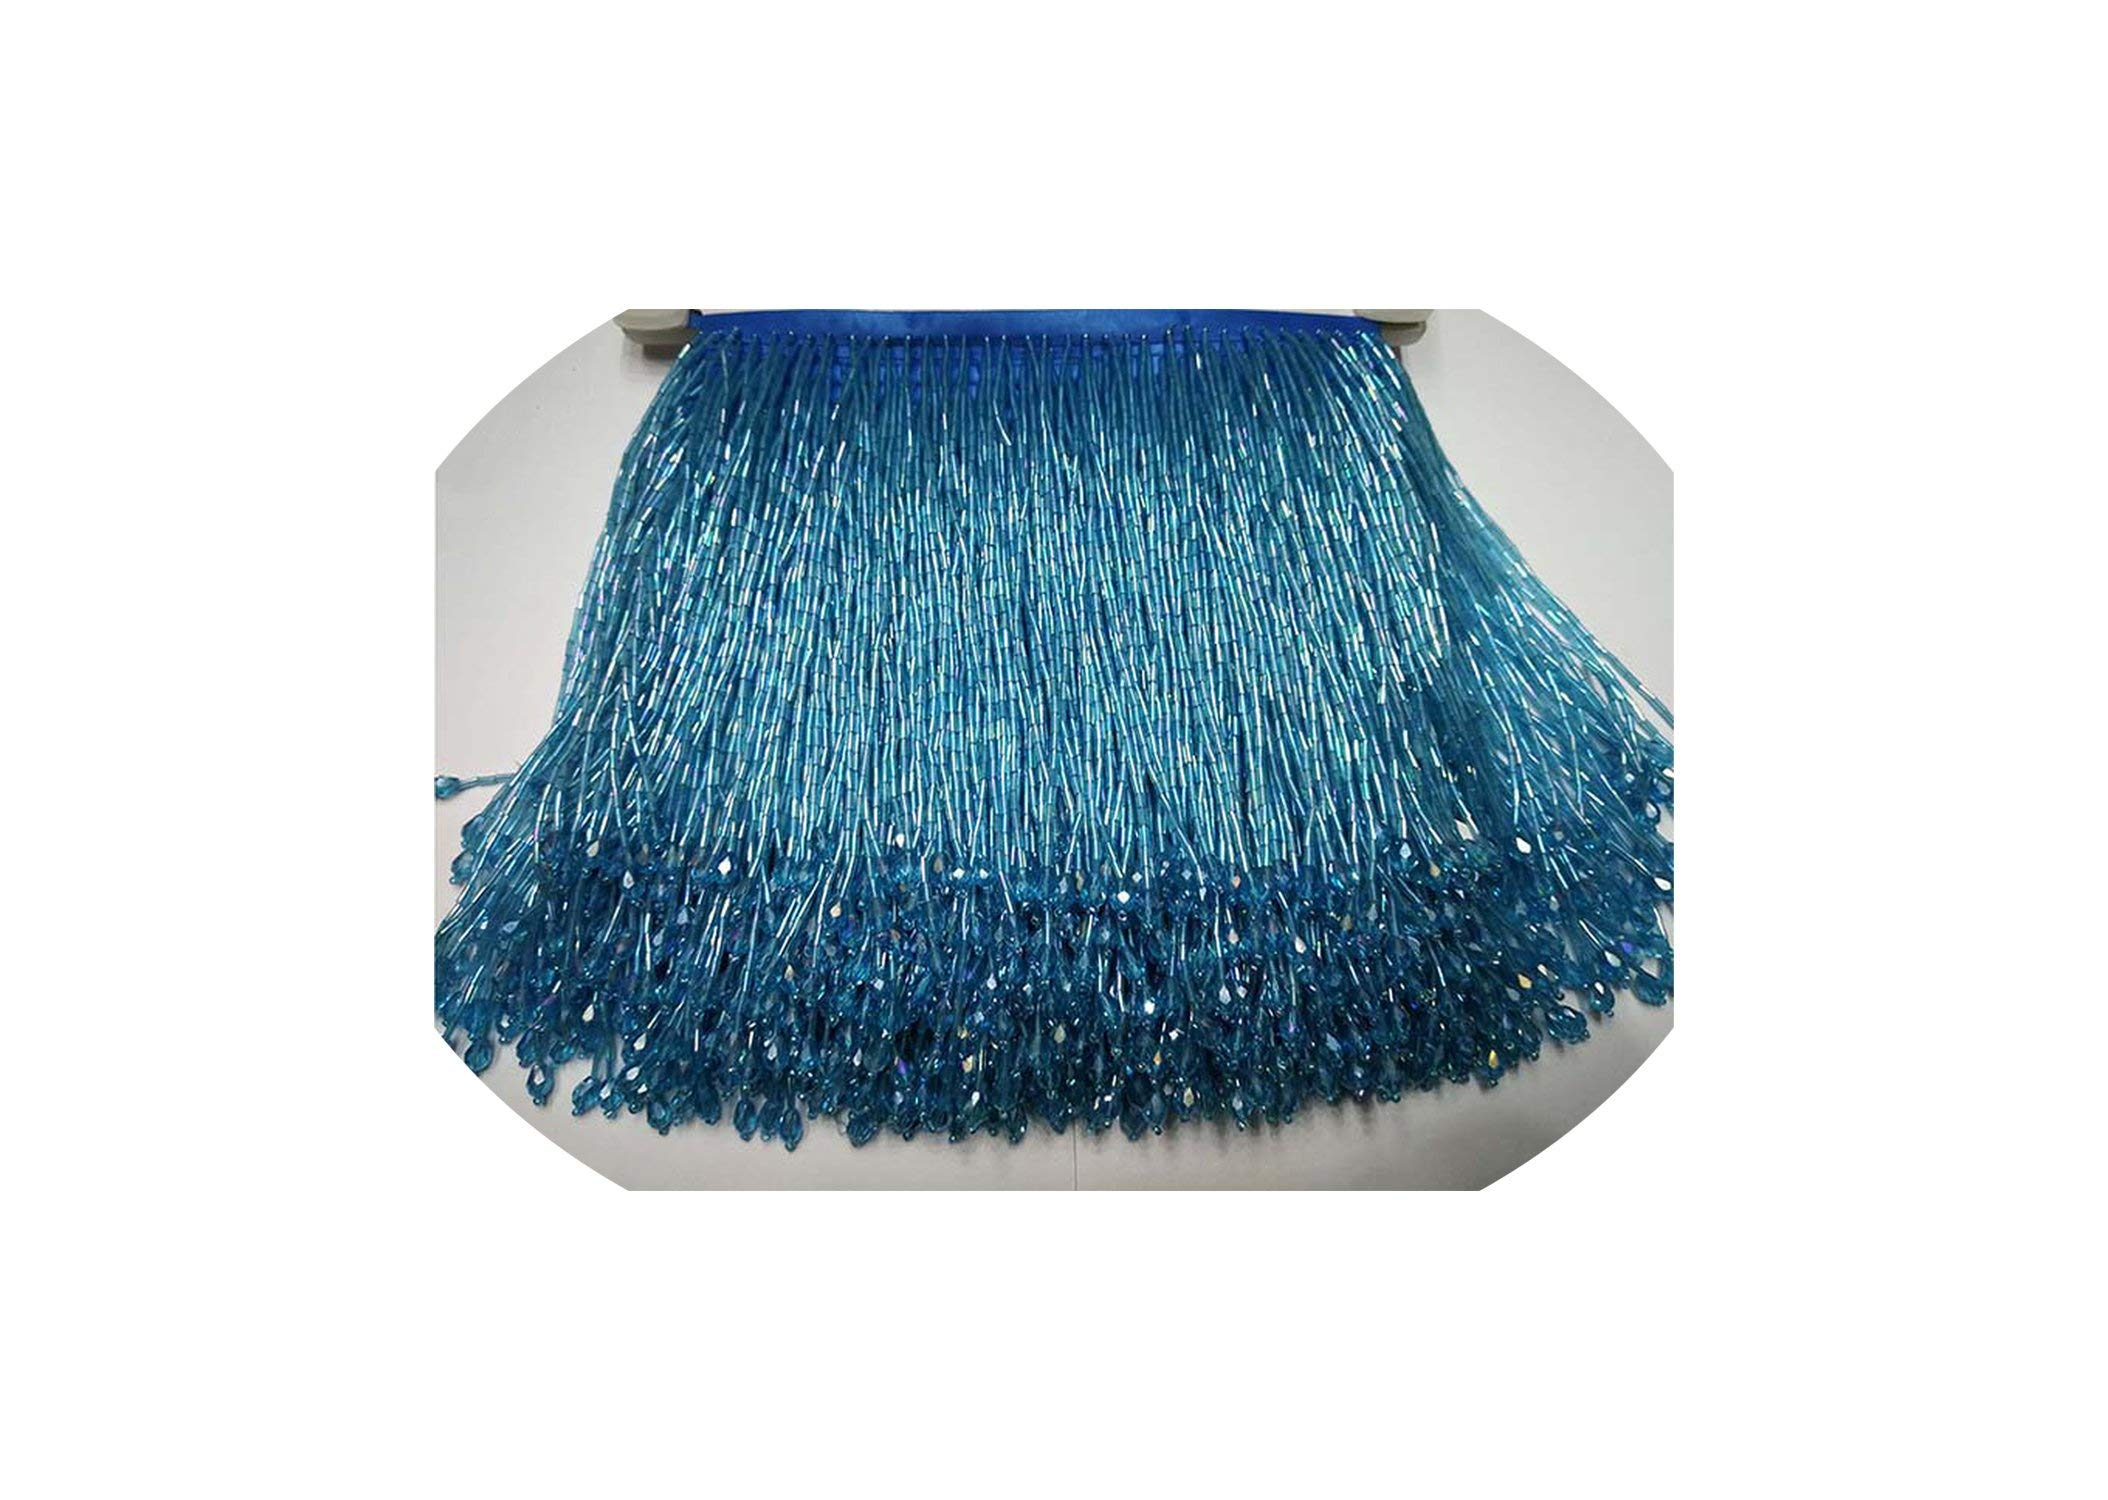 Tassels 5 .5Yard 15Cm Long Lace Bead Tube Lace Tassel Fringe Lace Trim Ribbon Sew Latin Dress Stage,Green by Li-Mei-Tassels